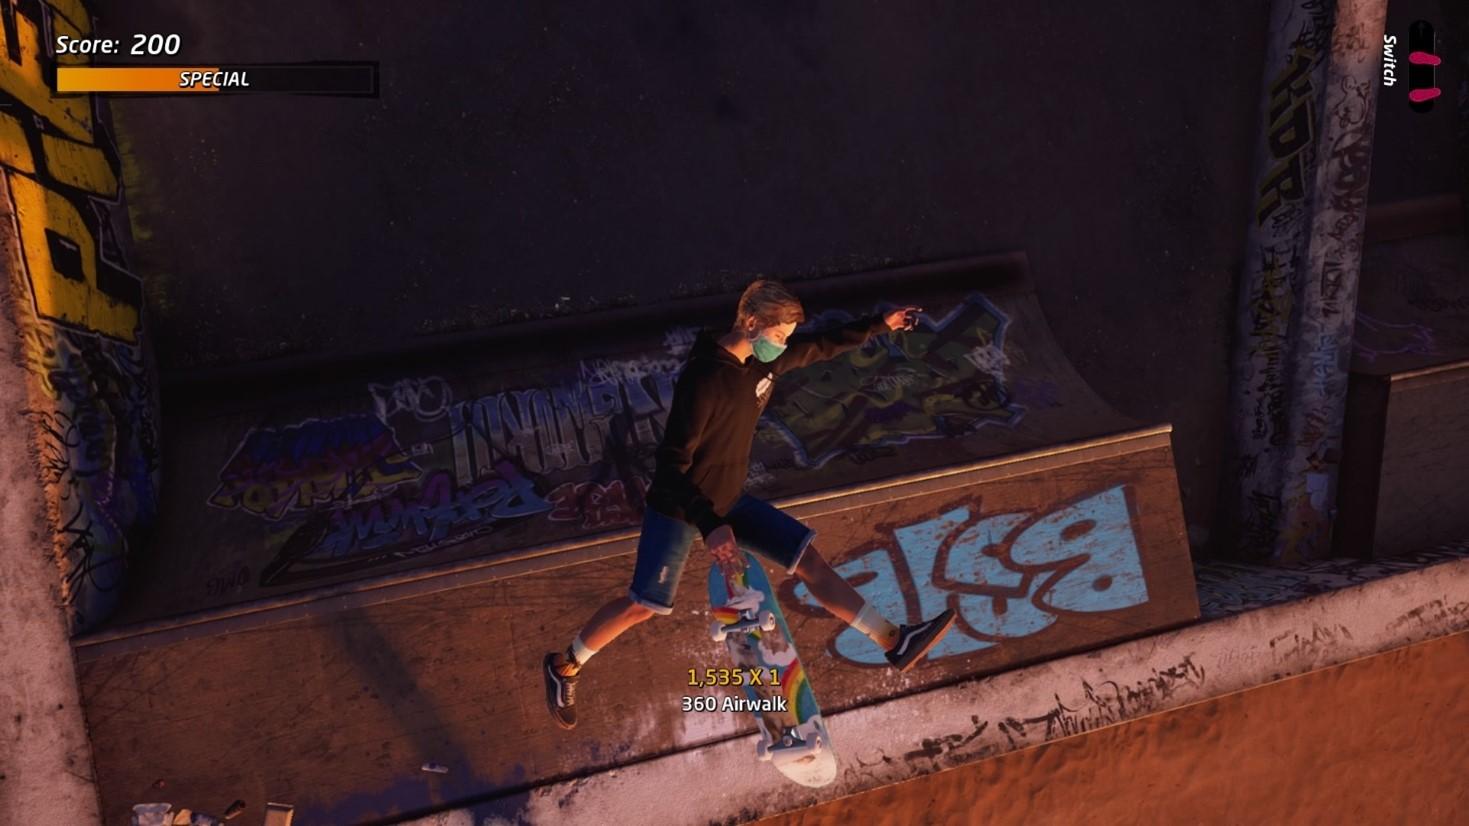 Player doing an Airwalk trick in the air.